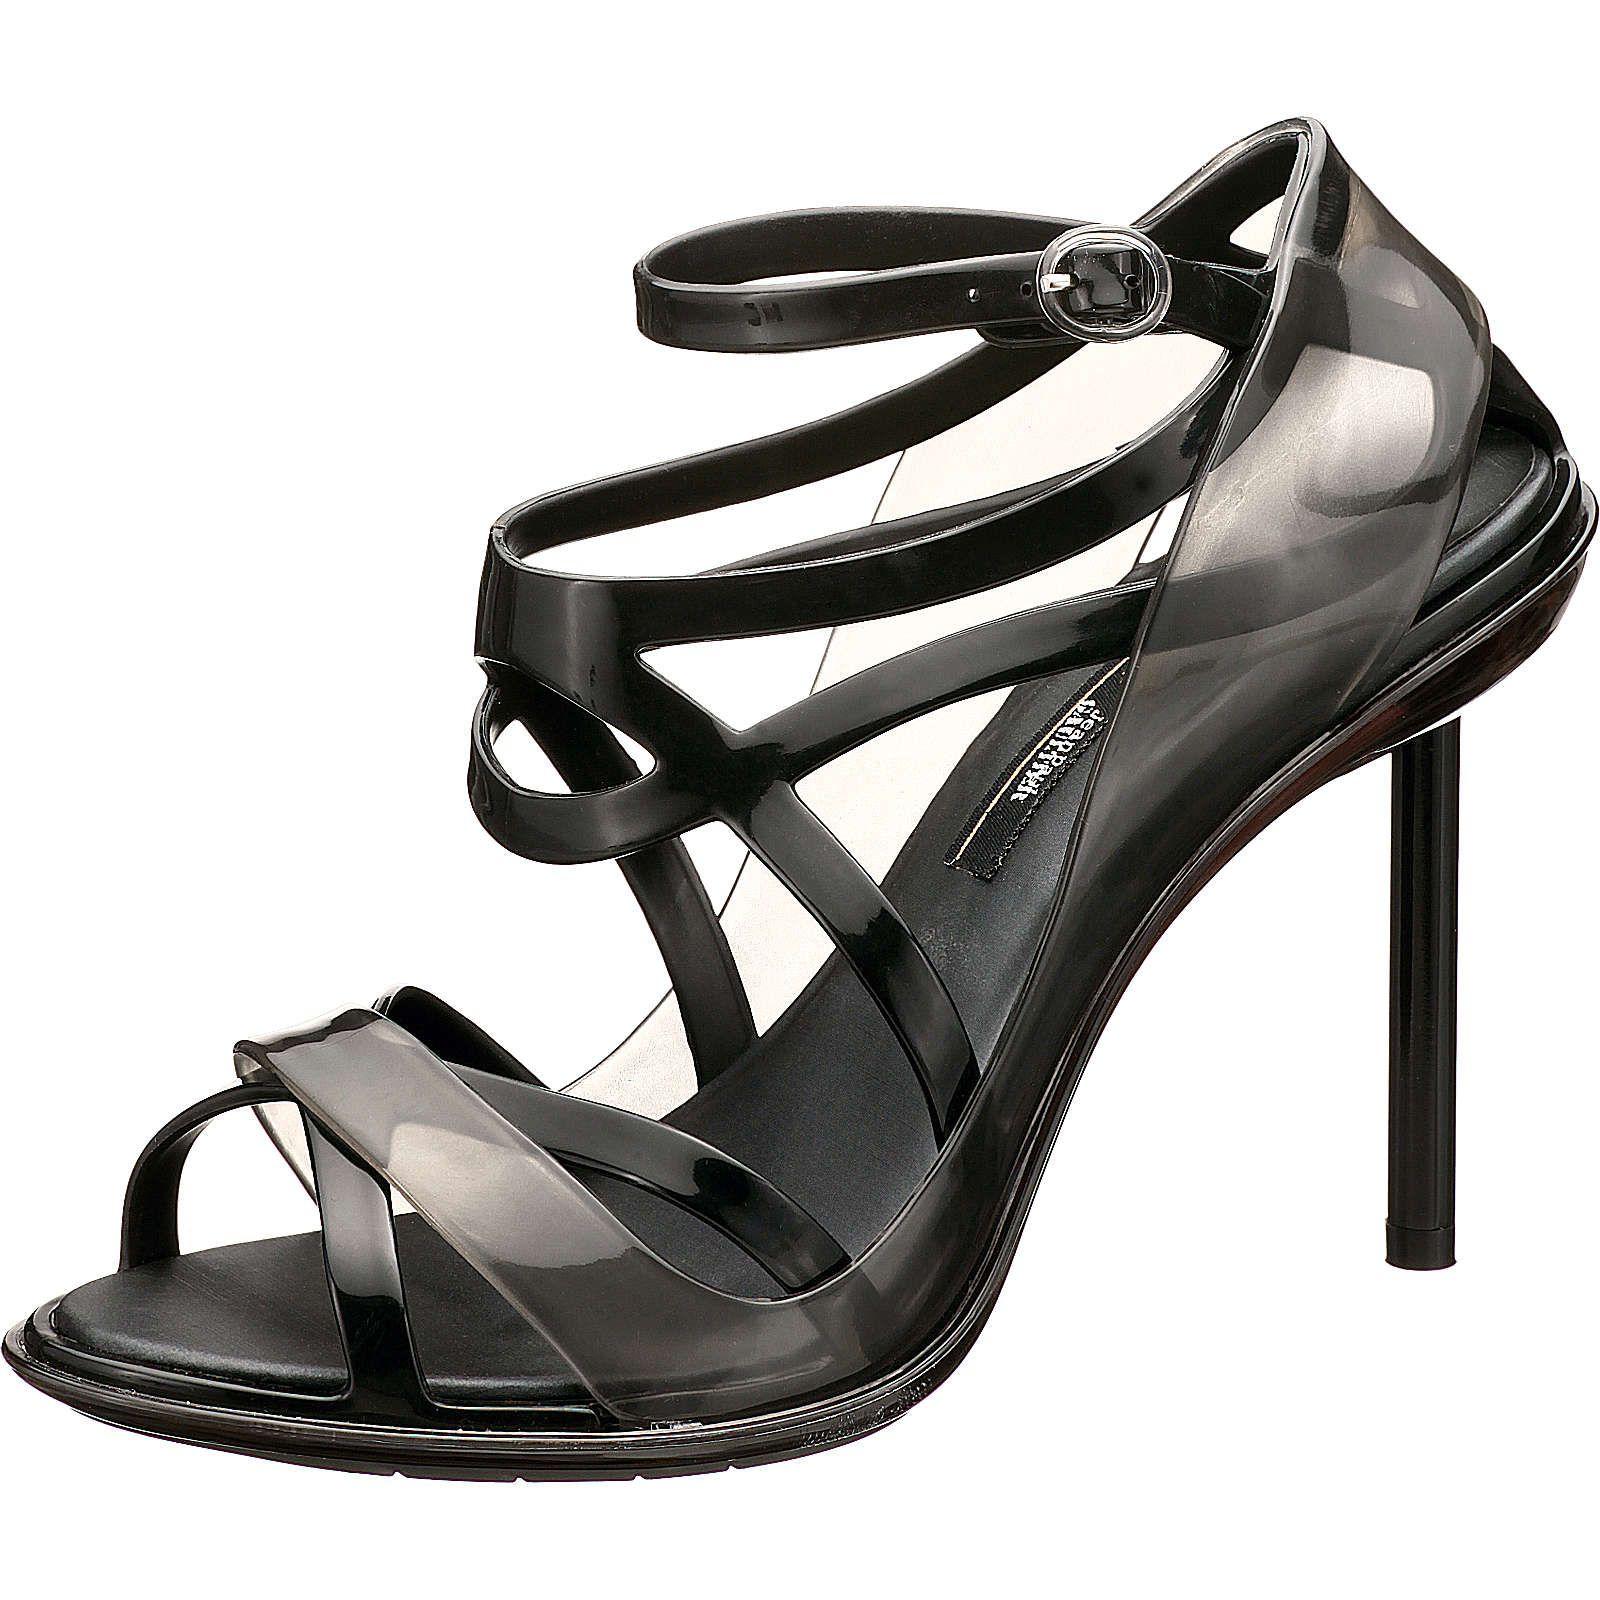 Resultados de la Búsqueda de imágenes de Google de http://www.marktshop24.com/bild/melissa-black-line-sandaletten-by-jean-paul-gaultier-schwarz-122-654332.jpg